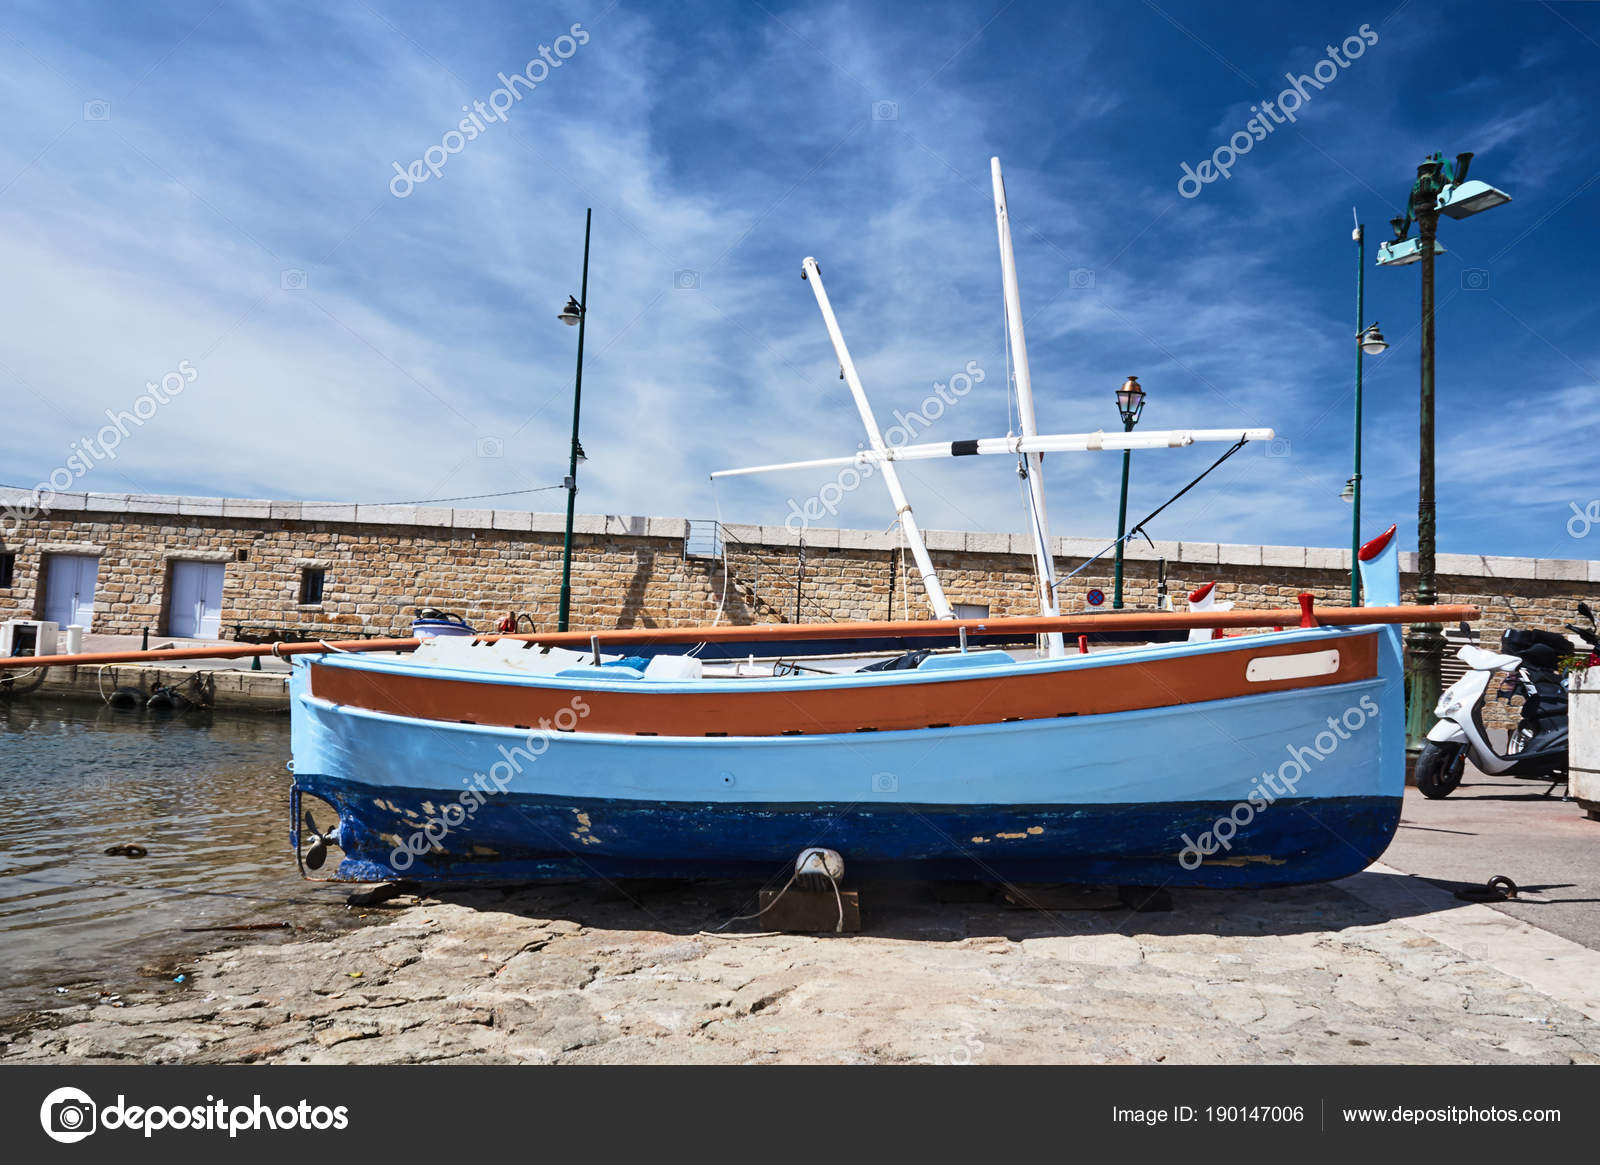 Wooden Sailboat Quay Port Saint Tropez France Stock Photo